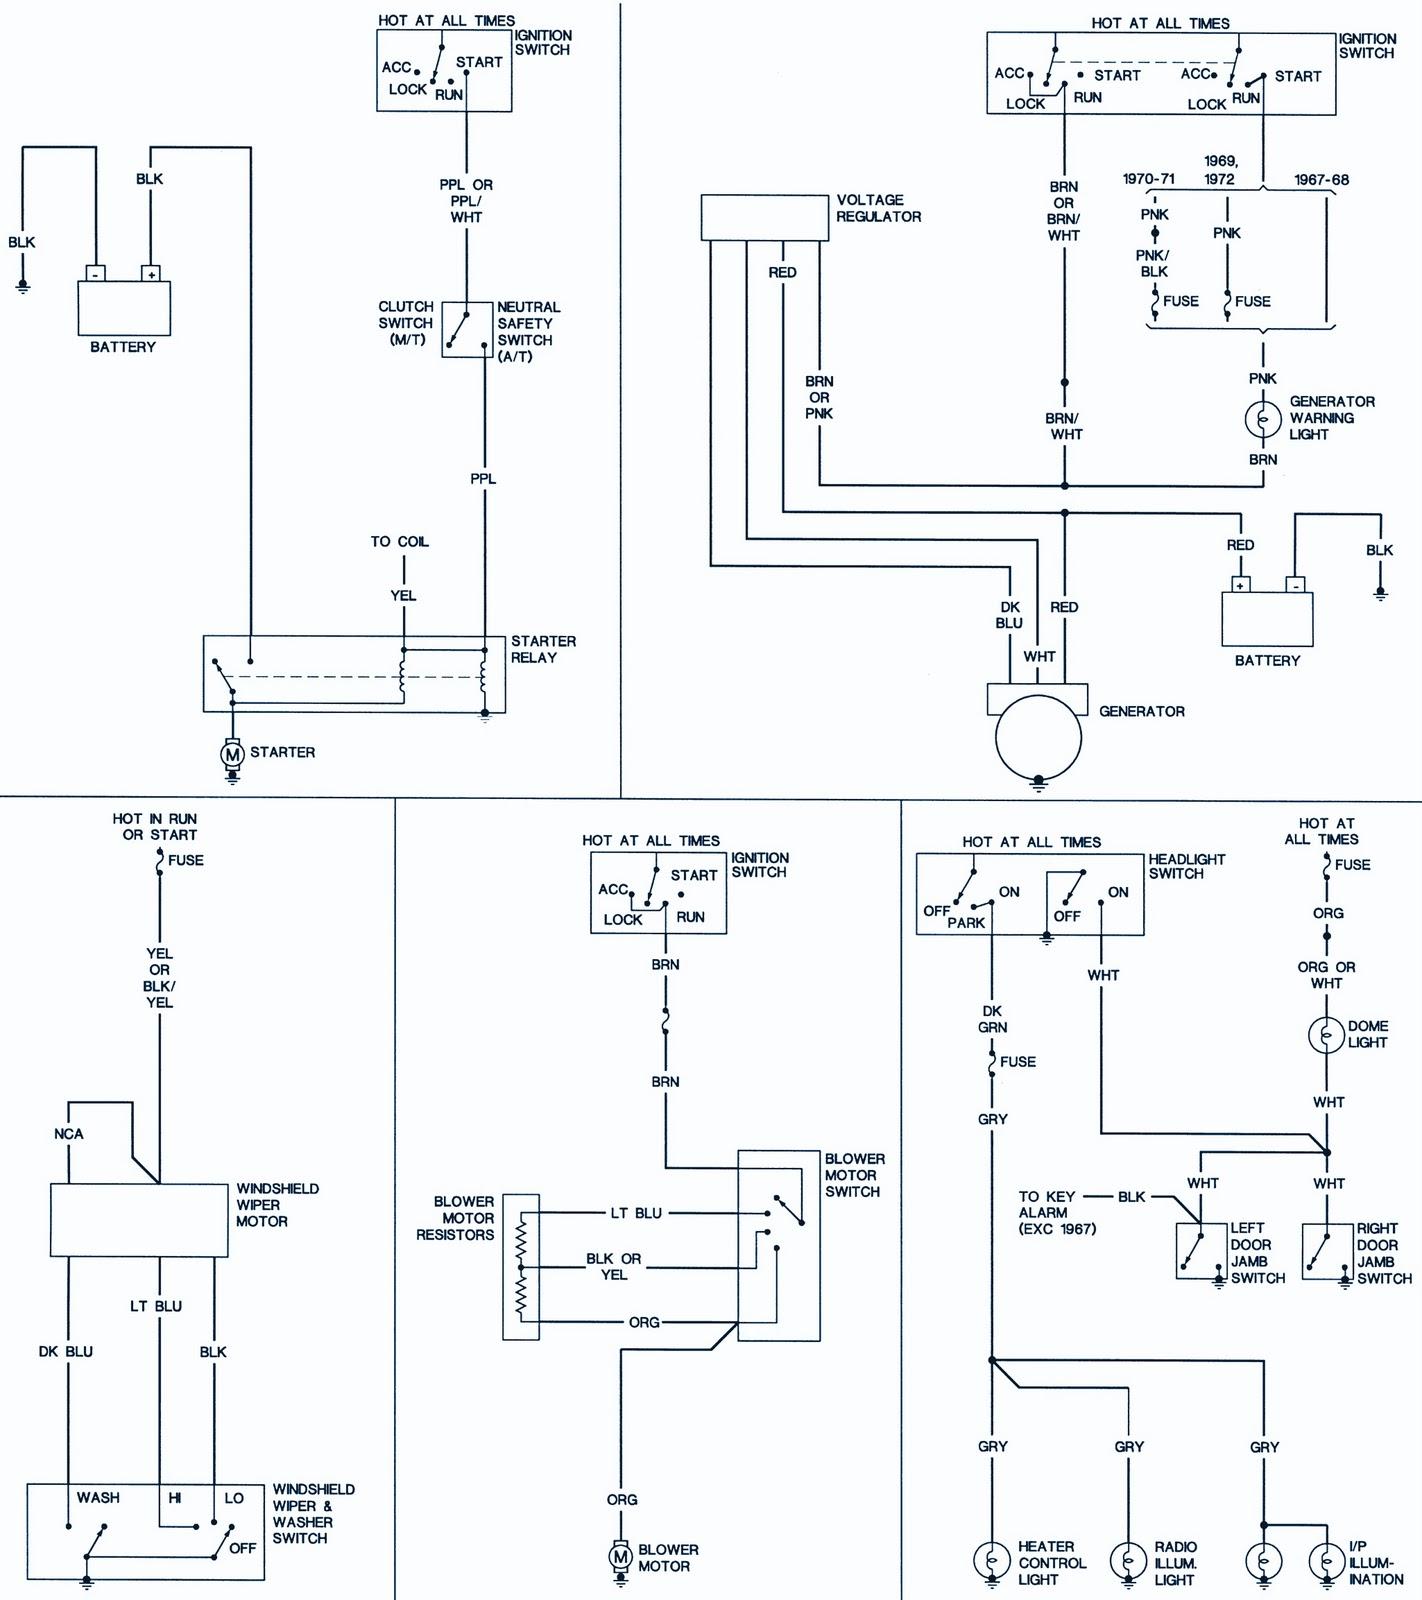 Remarkable 1968 Camaro Tach Wiring Basic Electronics Wiring Diagram Wiring Cloud Waroletkolfr09Org